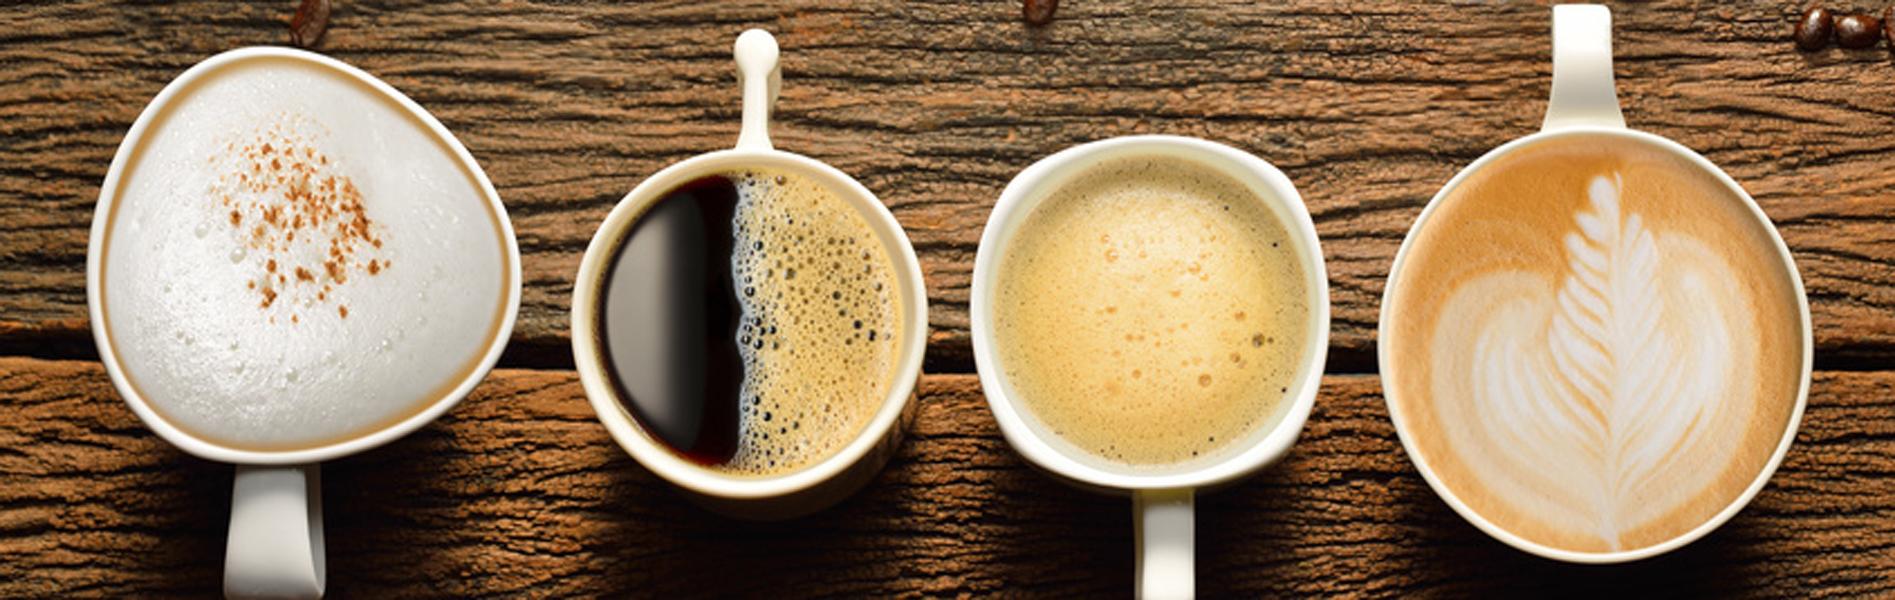 Unikorn catering - Heißgetränke & Kaffeespezialitäten